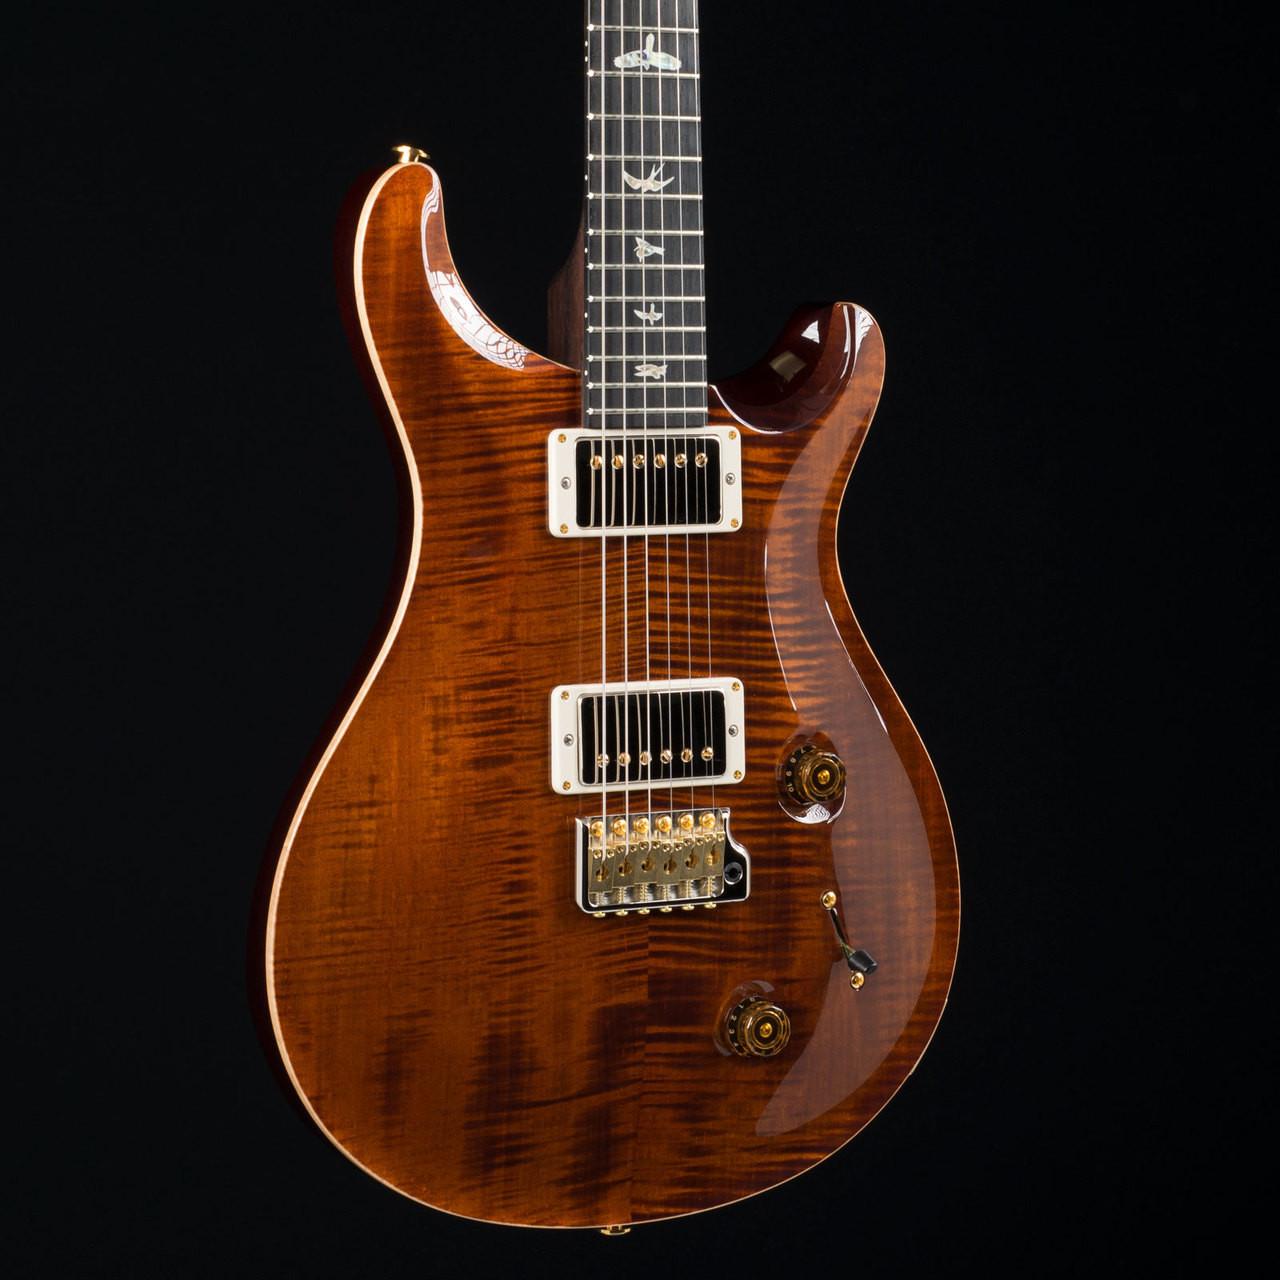 prs custom 22 10 top rosewood neck tortoise shell 8813 at moore guitars. Black Bedroom Furniture Sets. Home Design Ideas